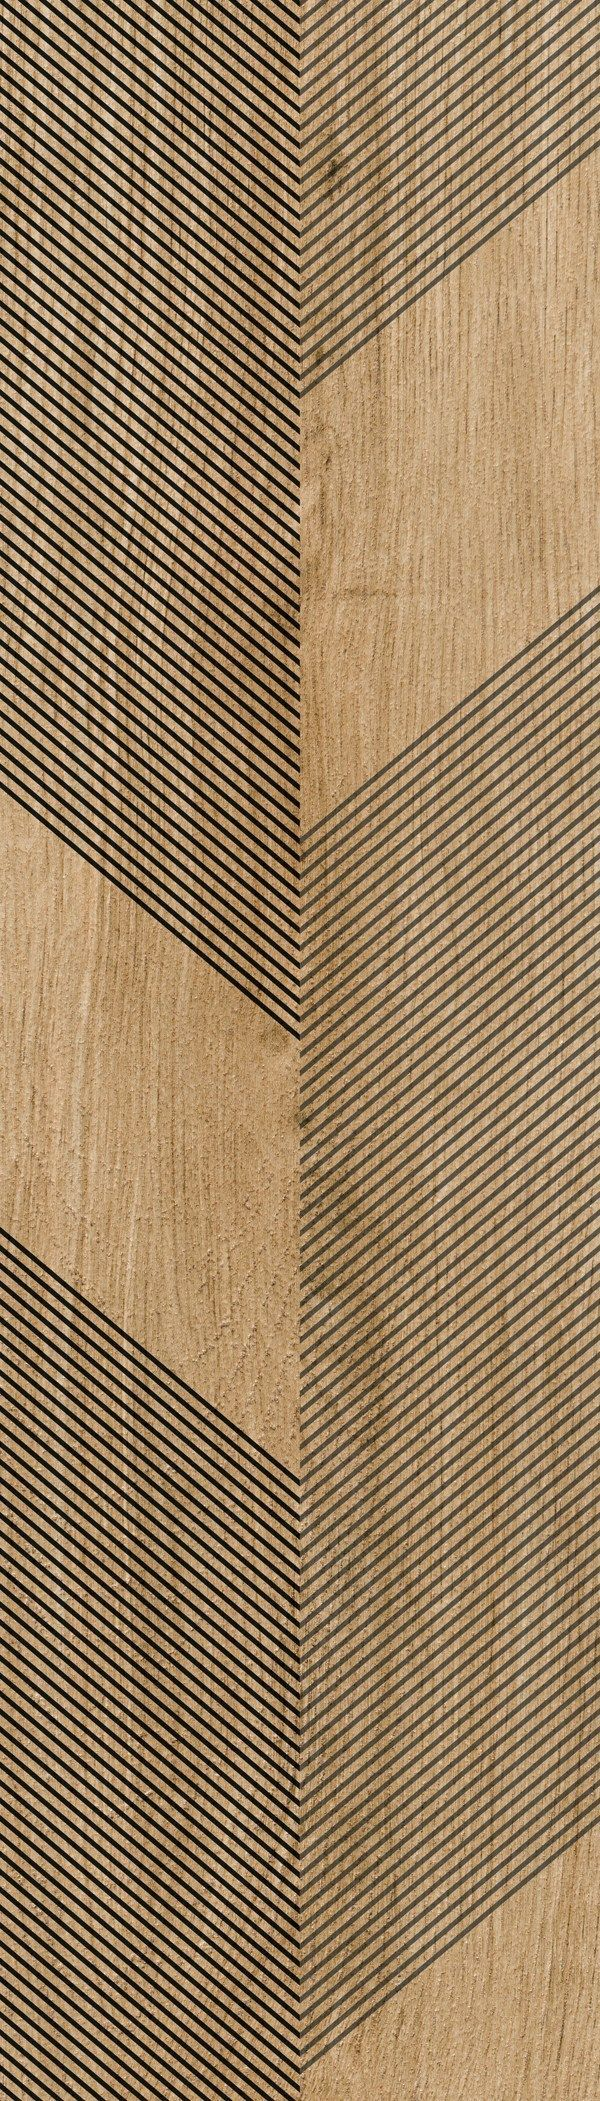 Neue raumwandgestaltung floor tiles type slimtech  lea ceramiche  geometrie  pinterest